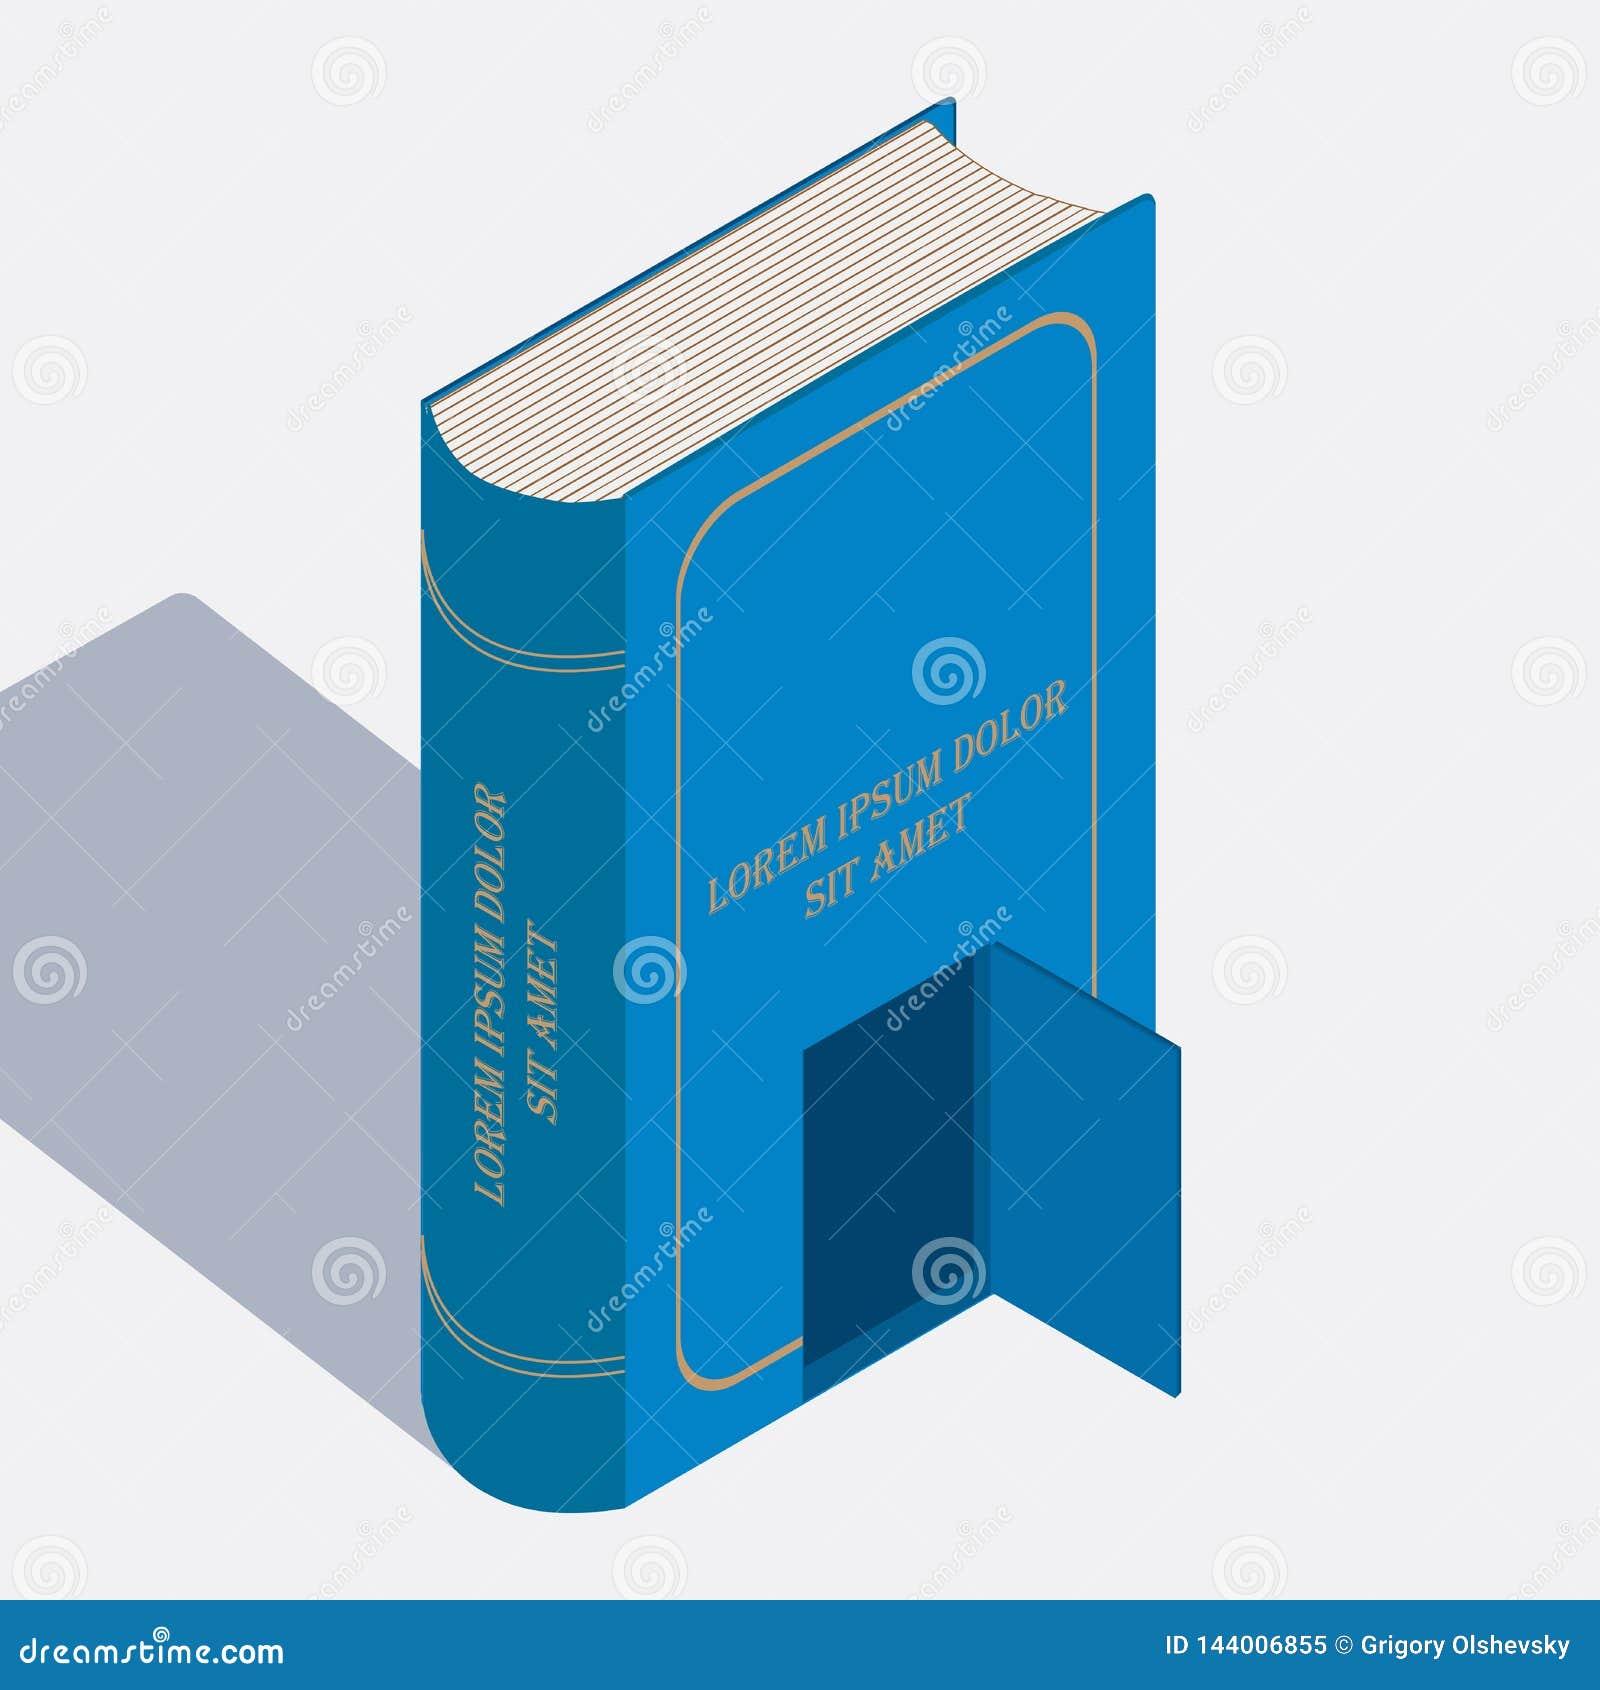 Book isometric image. Fulcolor designe elevrnt